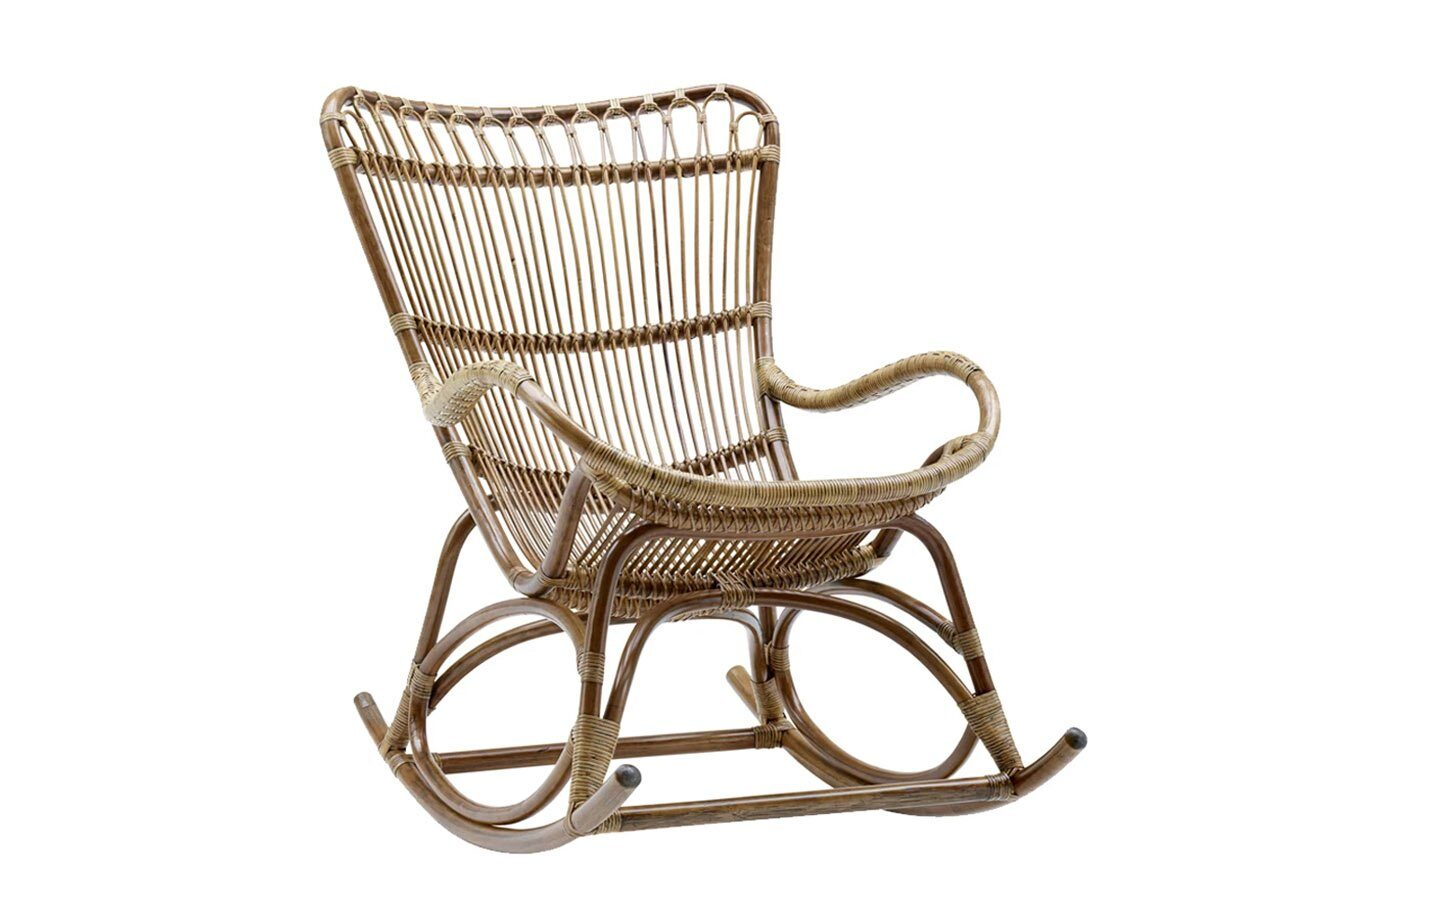 Monet-Rattan-Rocking-Chair-fabiia-01